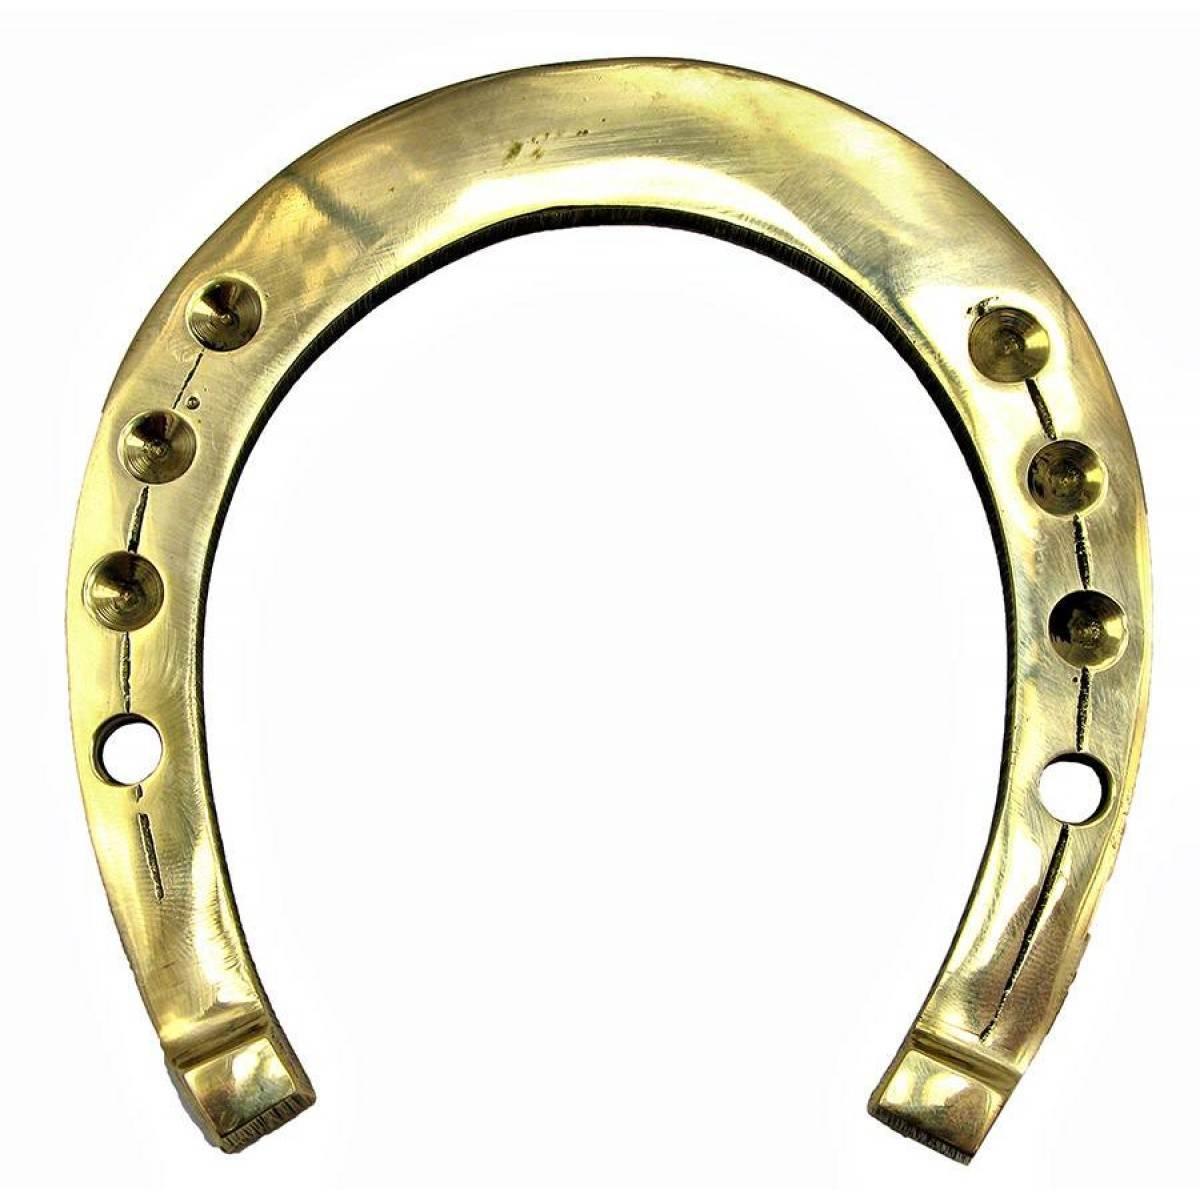 Подкова бронзовая (10 шт/уп.) (11х10,5 см)